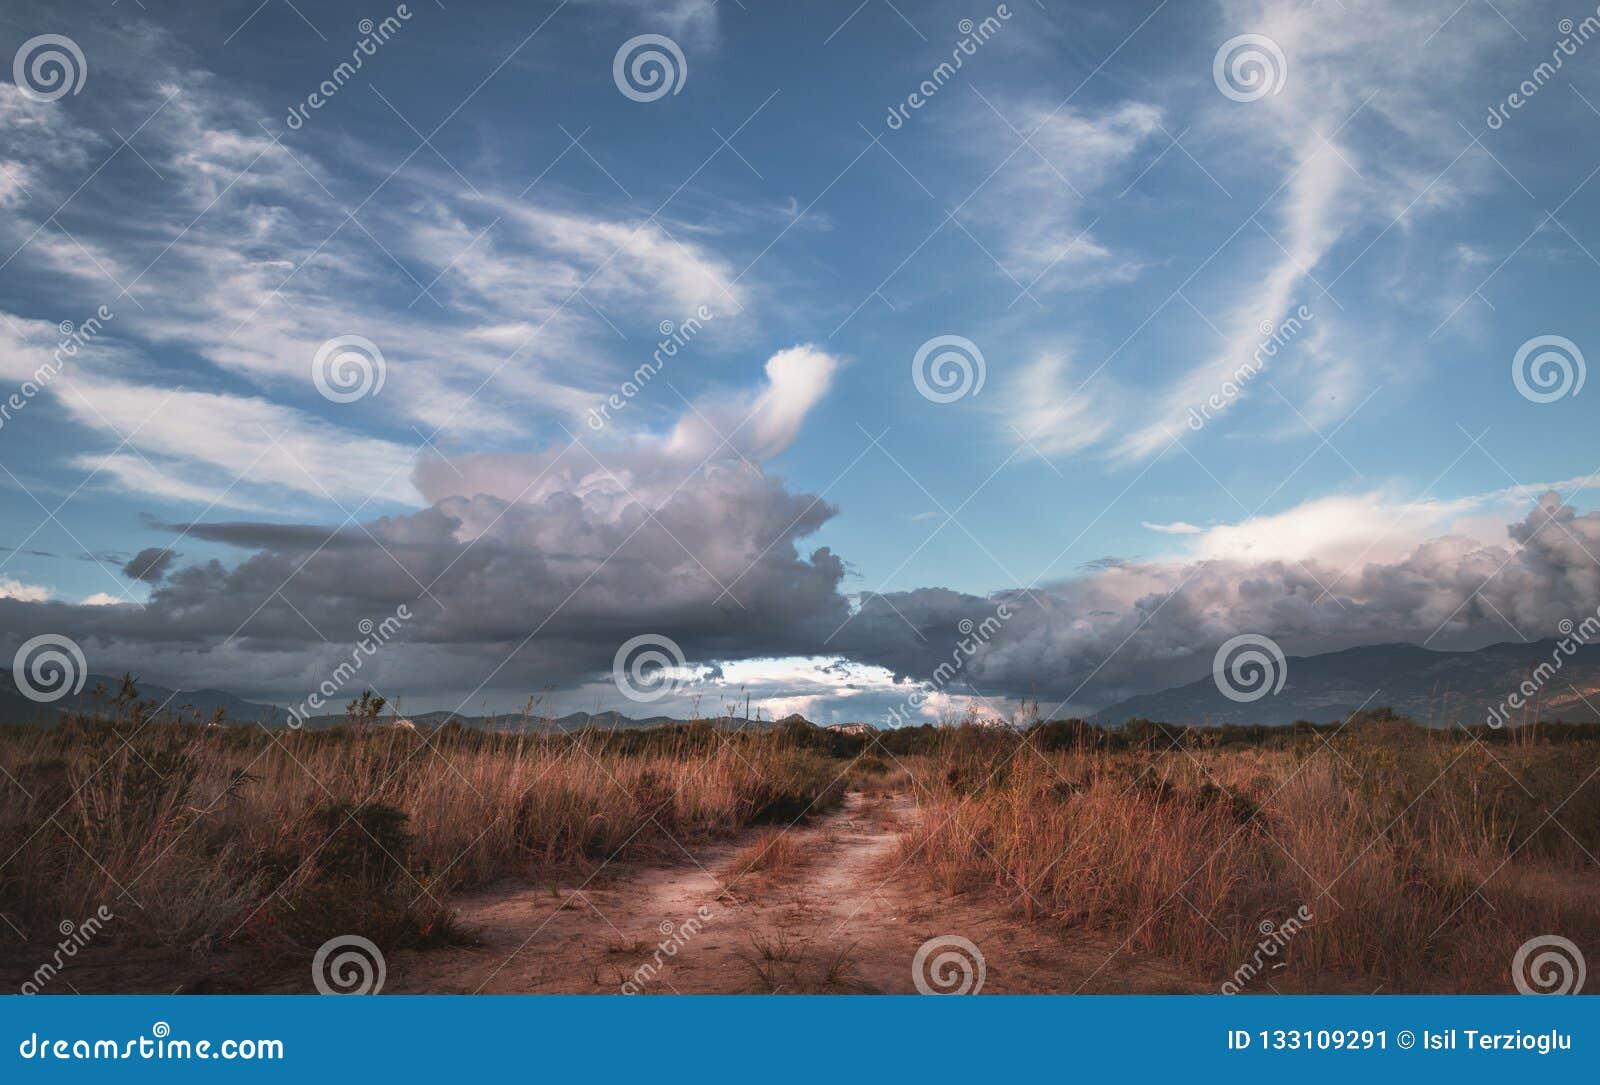 Rural pathway in the grass in Kalkan Patara.